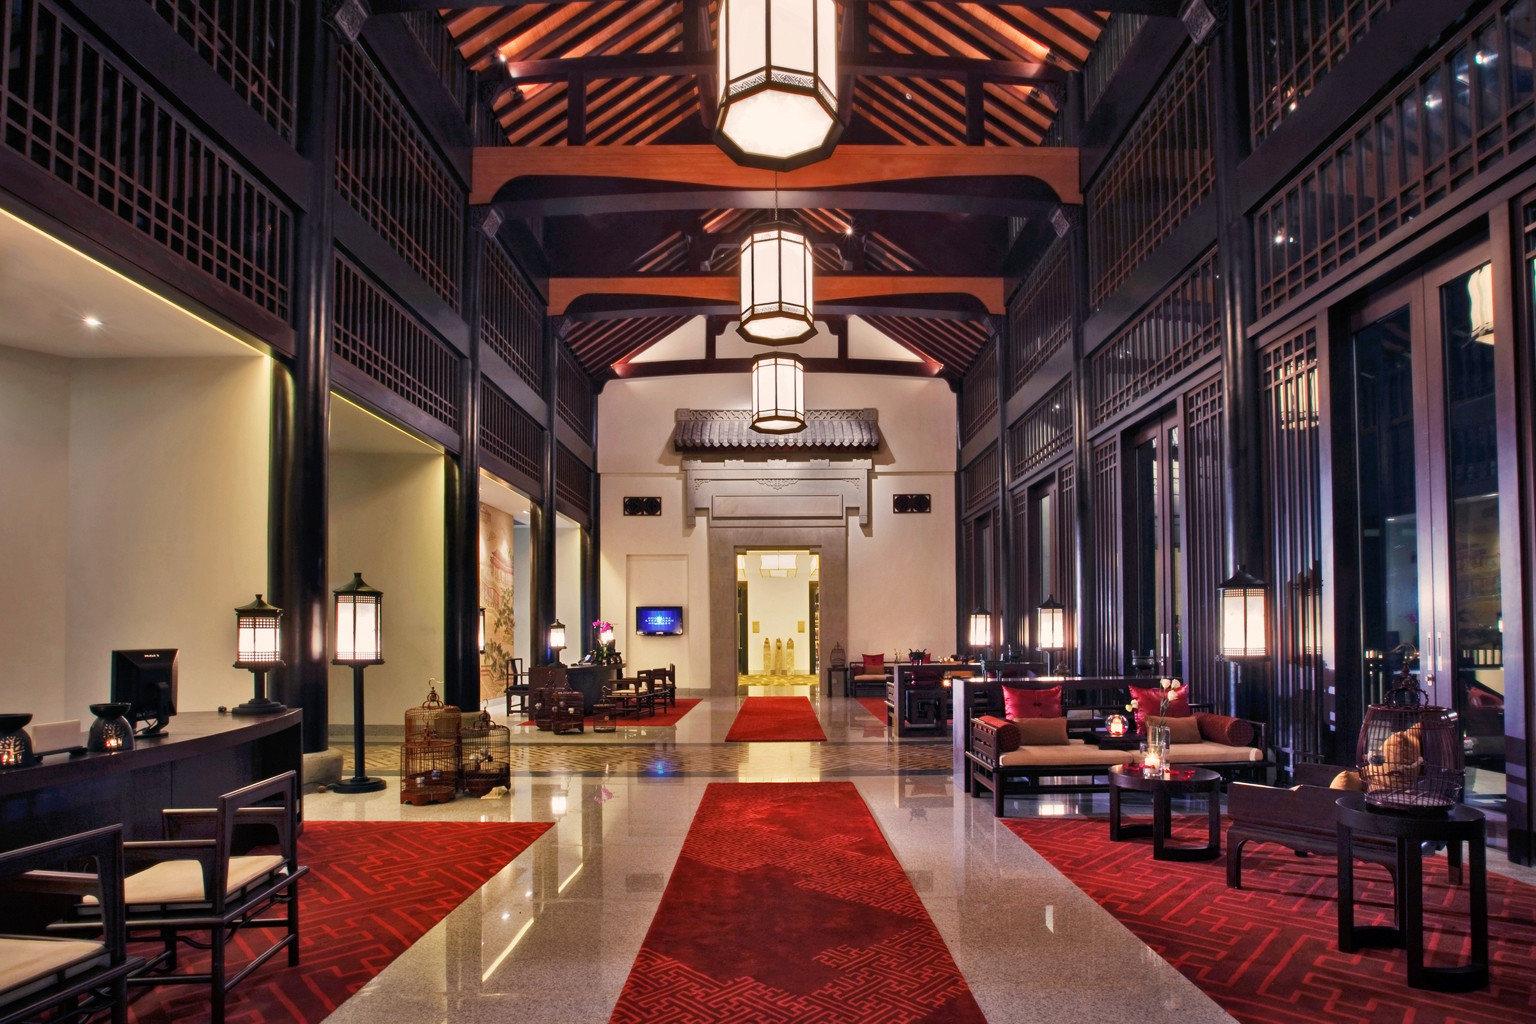 Elegant Lobby Luxury function hall auditorium convention center ballroom conference hall restaurant hall